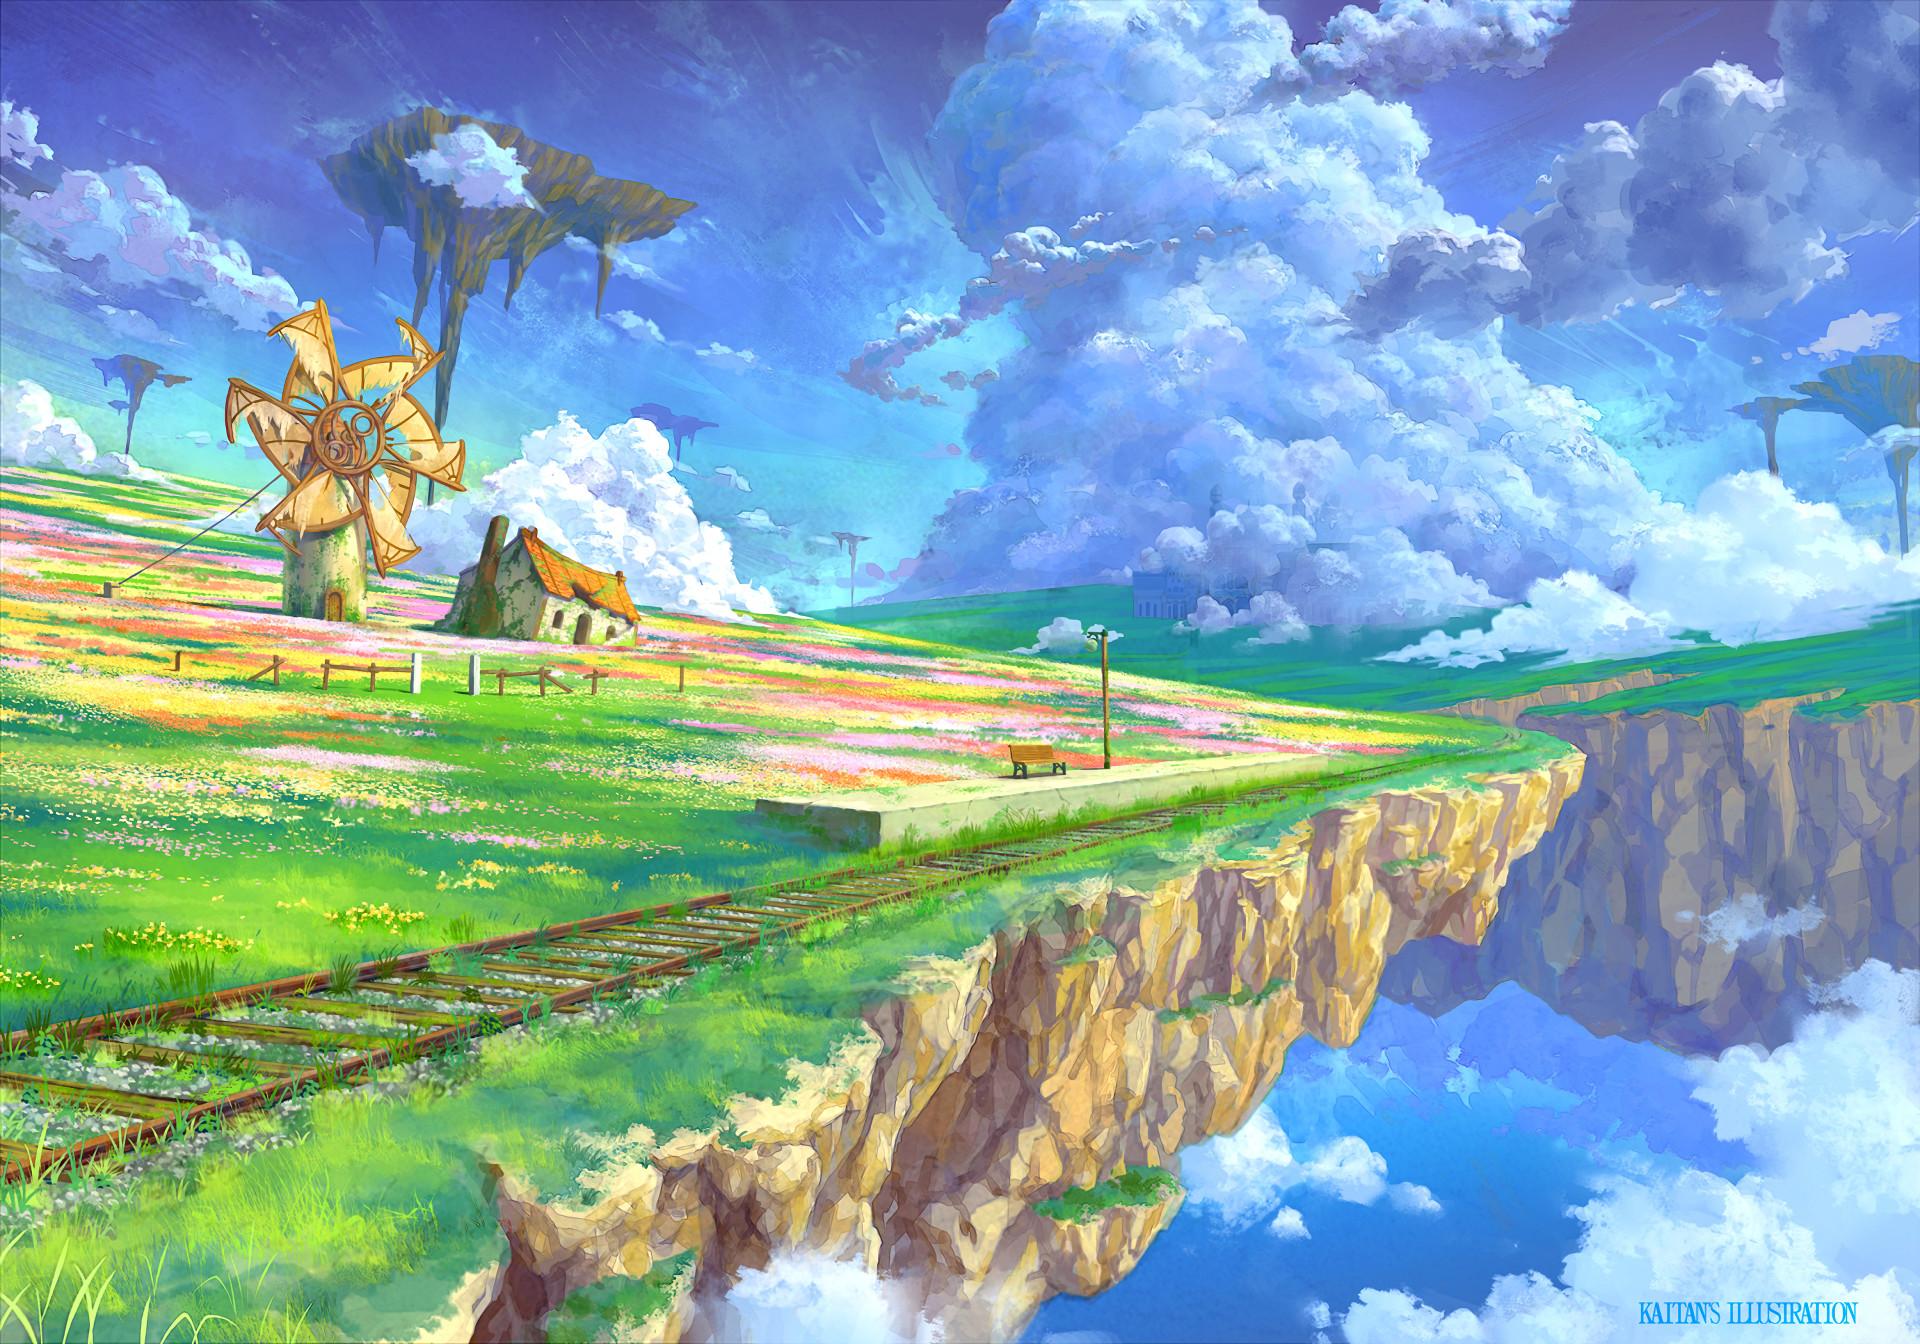 Anime – Original Cloud Landscape Flower Scenic Sky Train Station Windmill  Nature Floating Island Wallpaper